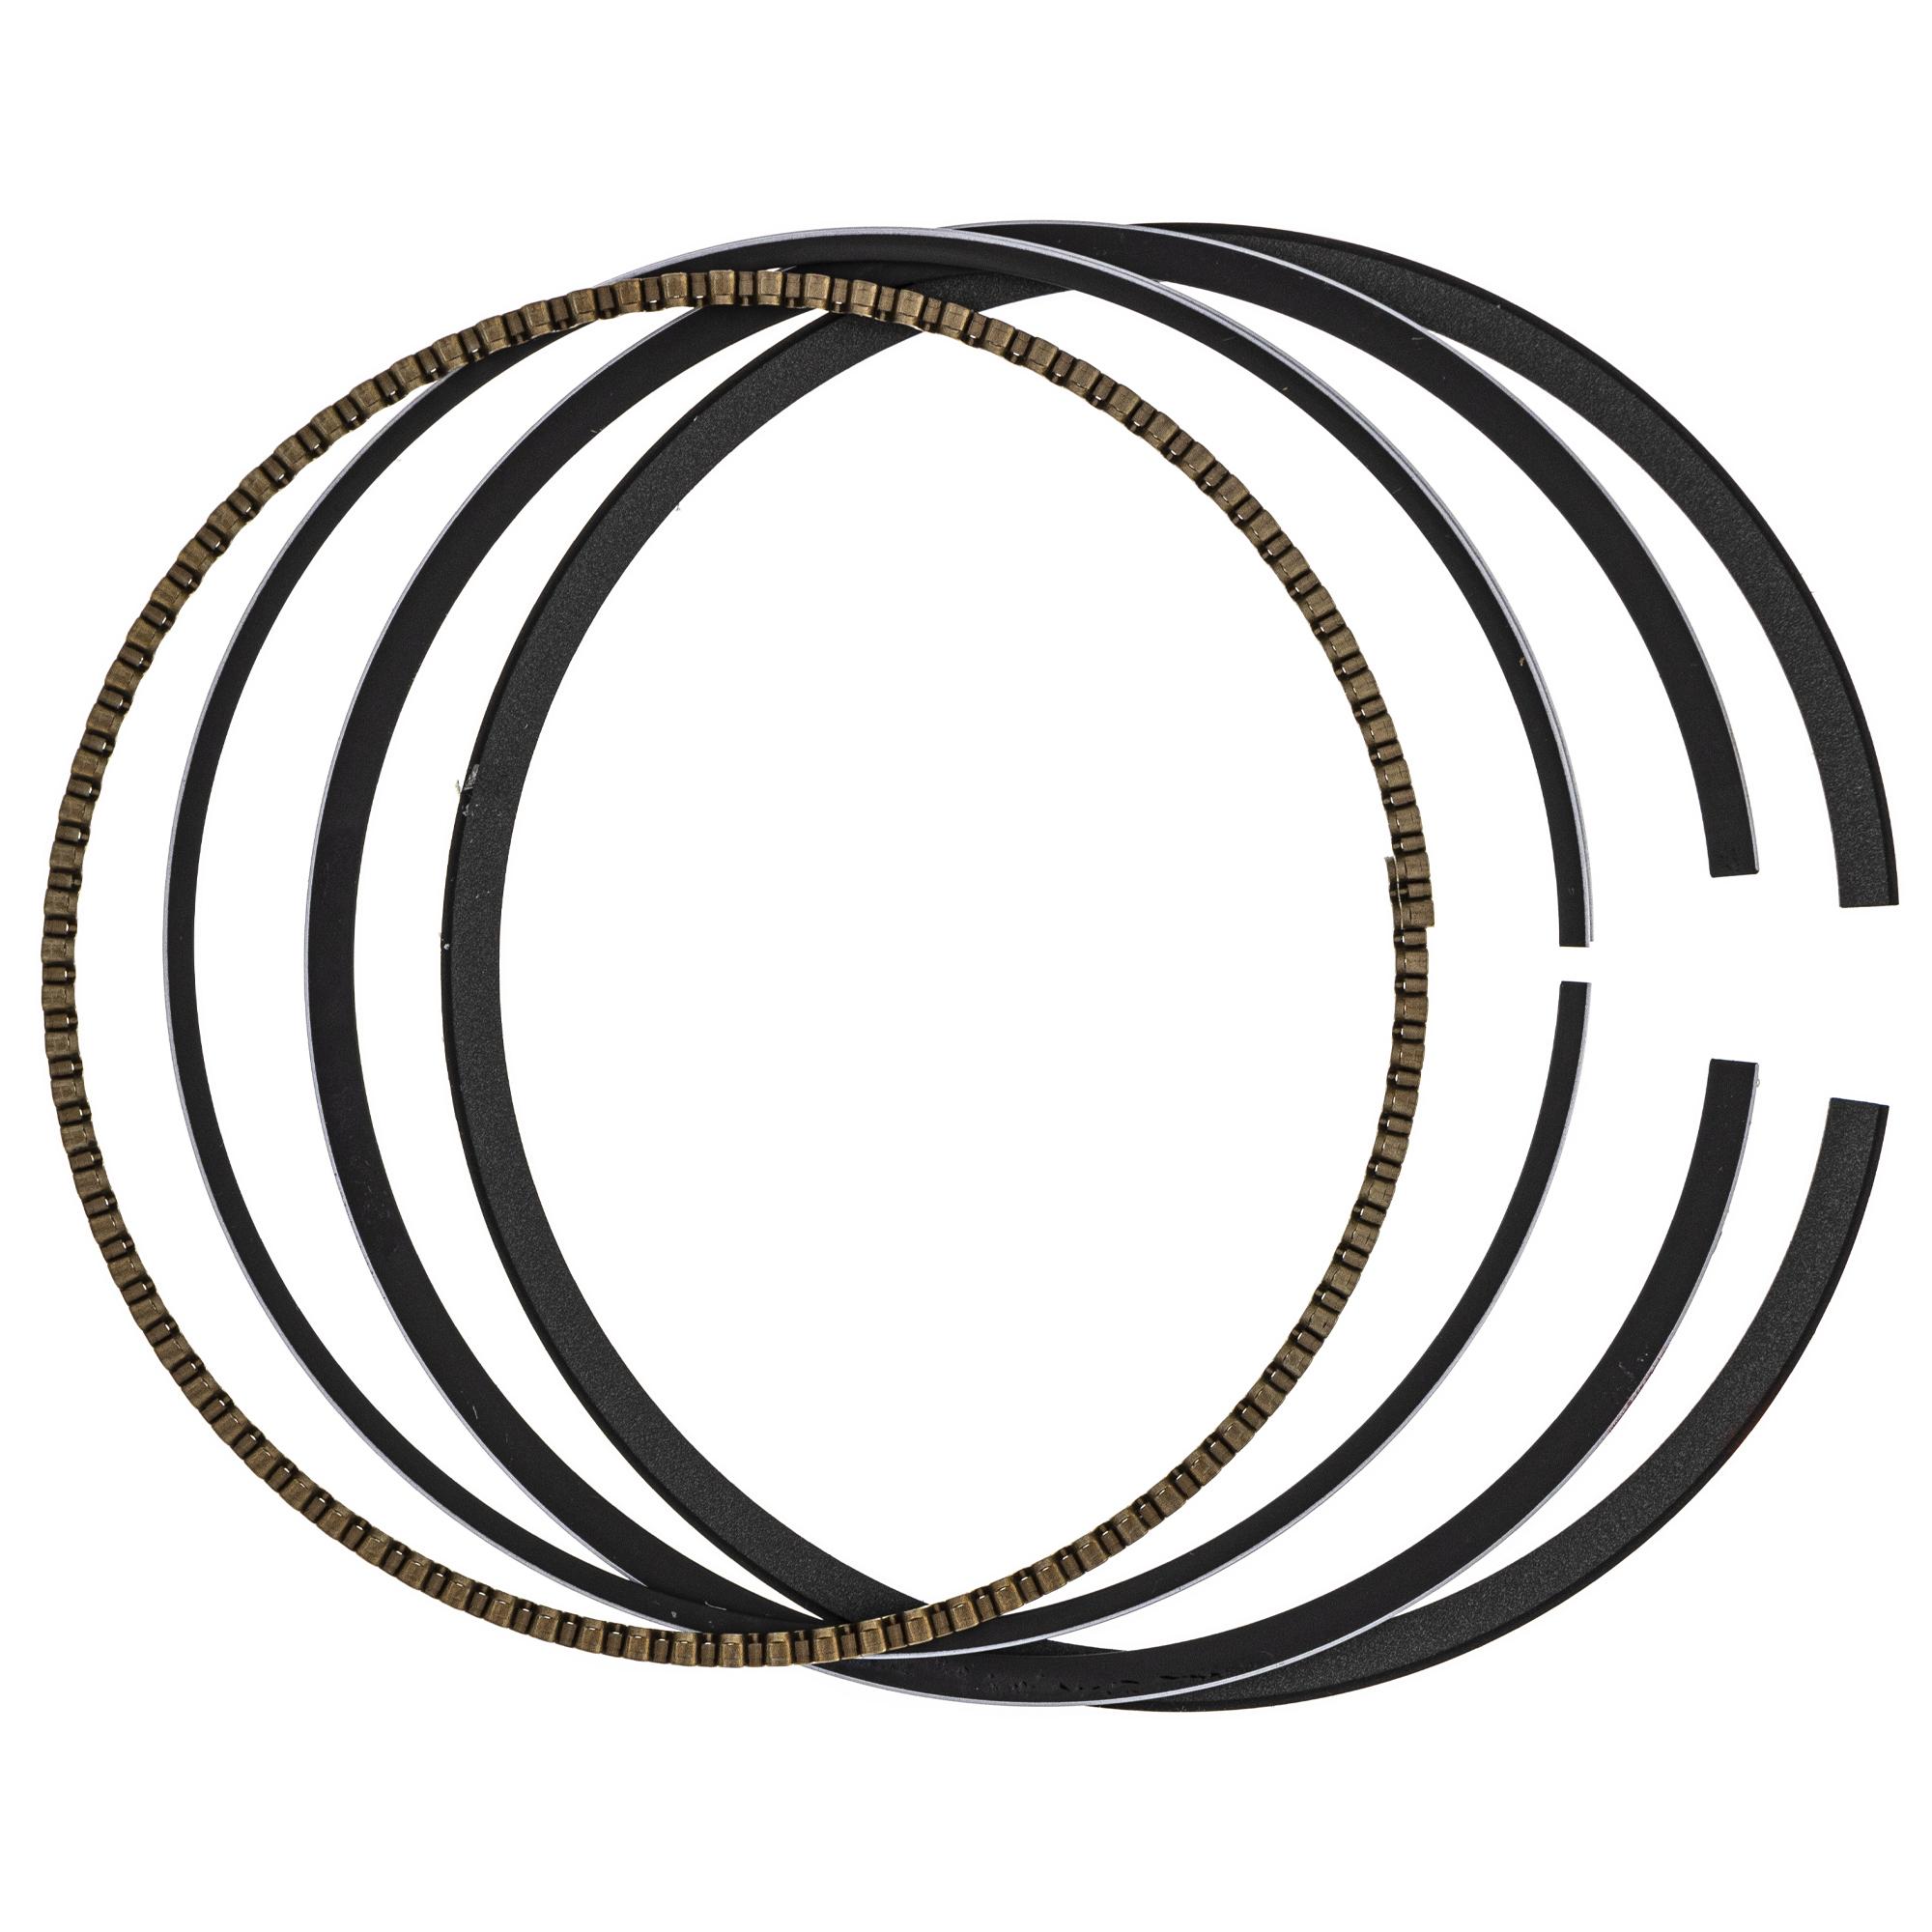 Piston Ring Kit 2003-2018 Can-Am Outlander Renegade